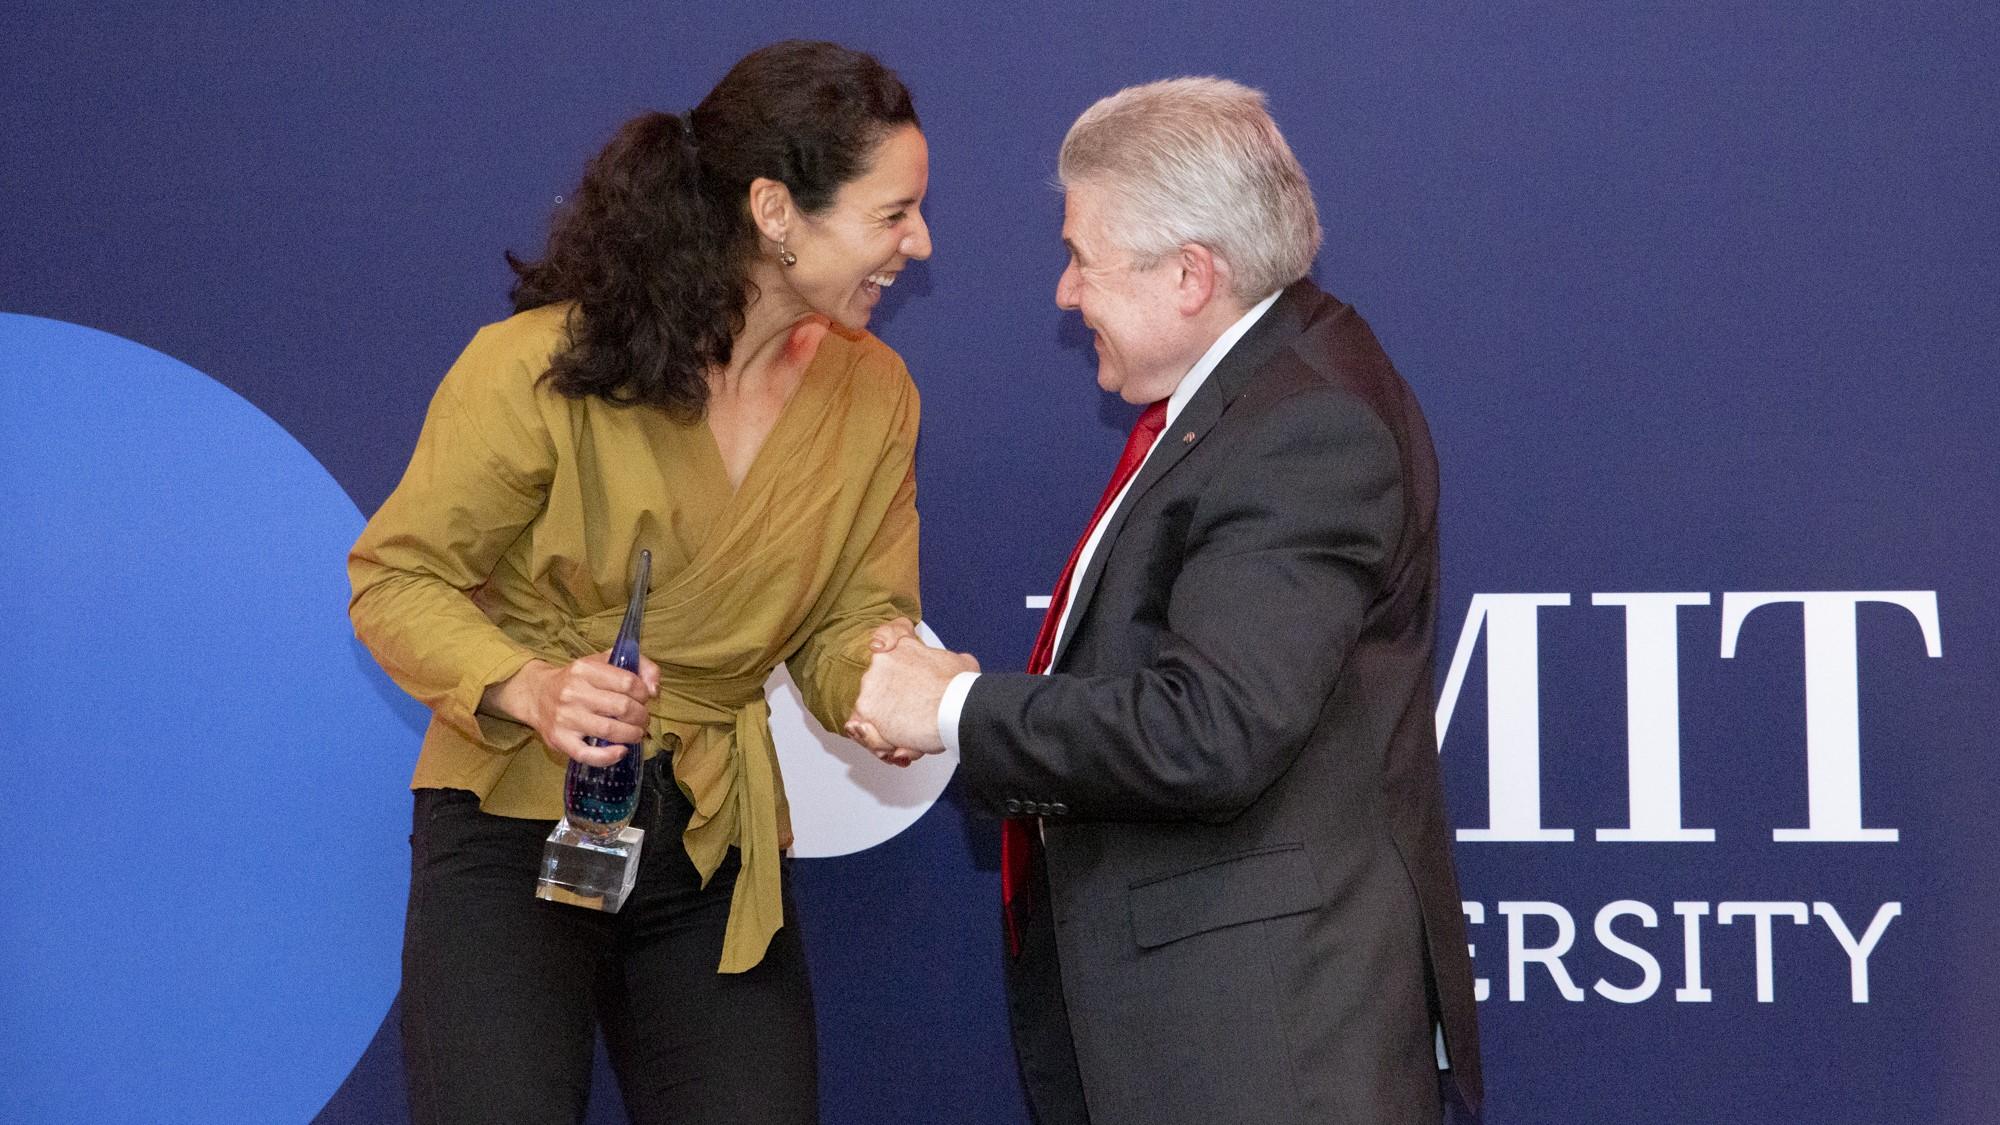 Christine Nunn named RMIT University Athlete of the Year